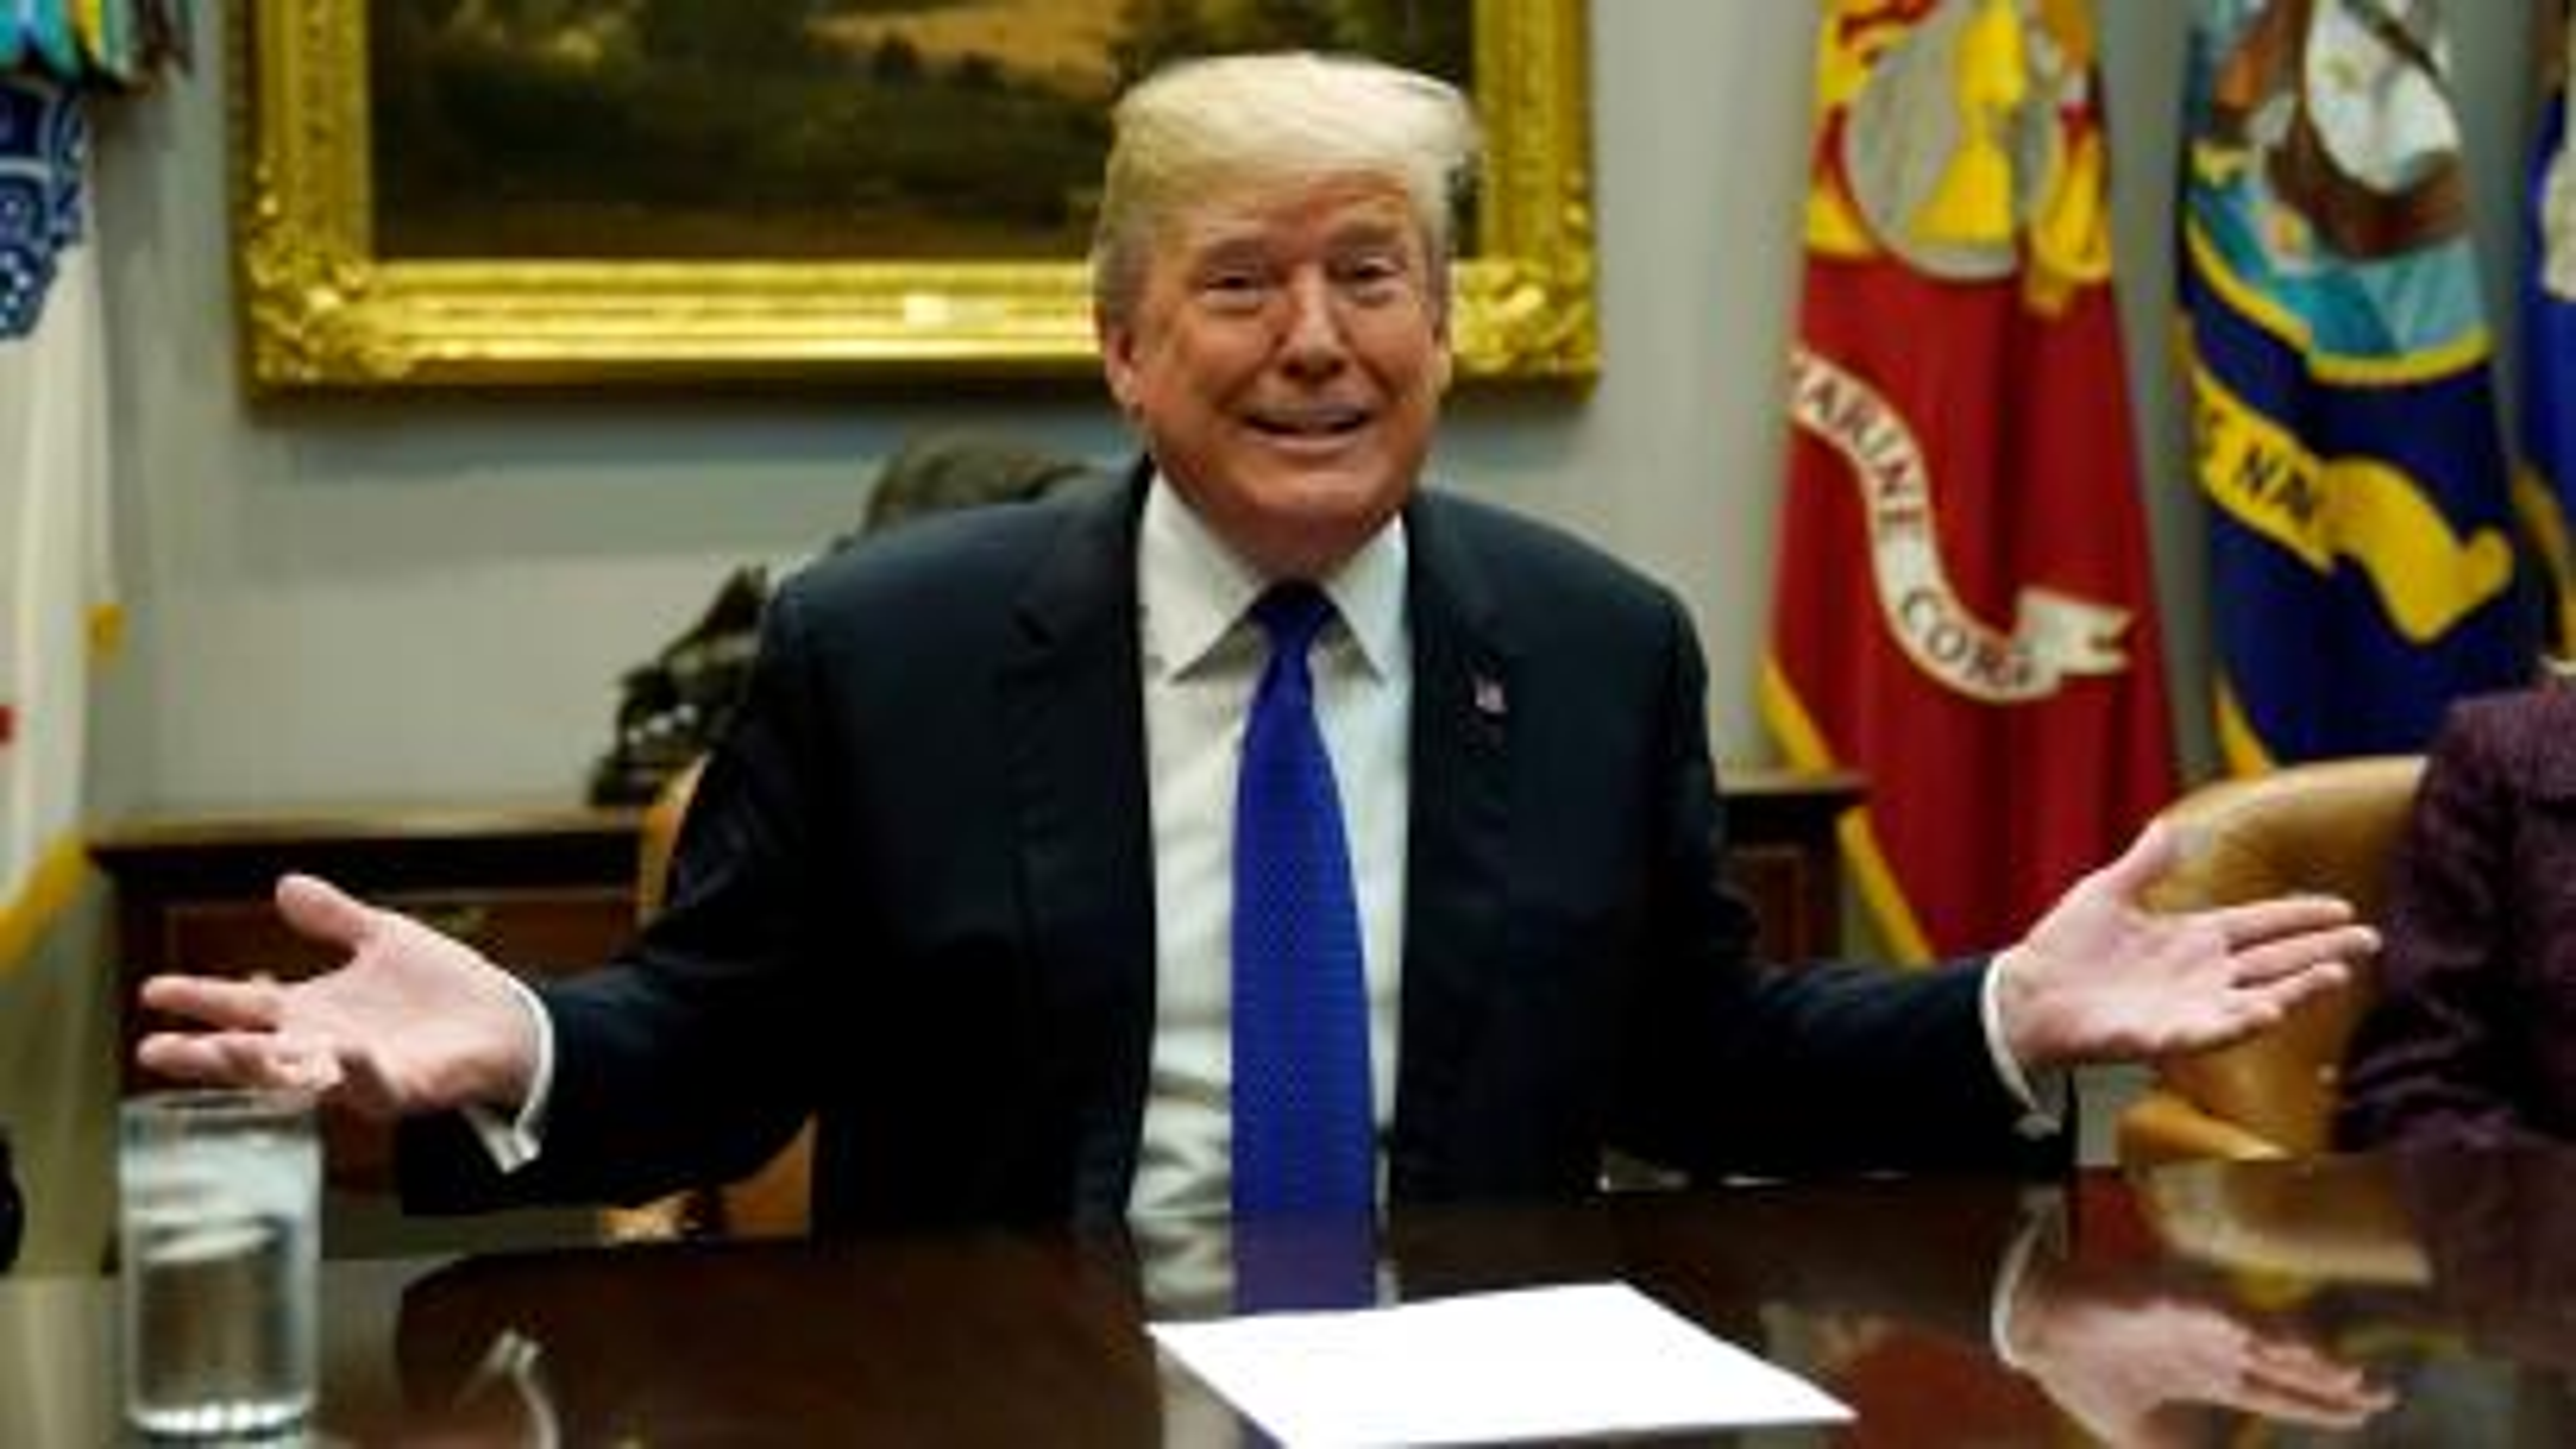 US visa I-130: Donald Trump's chain migration crackdown is